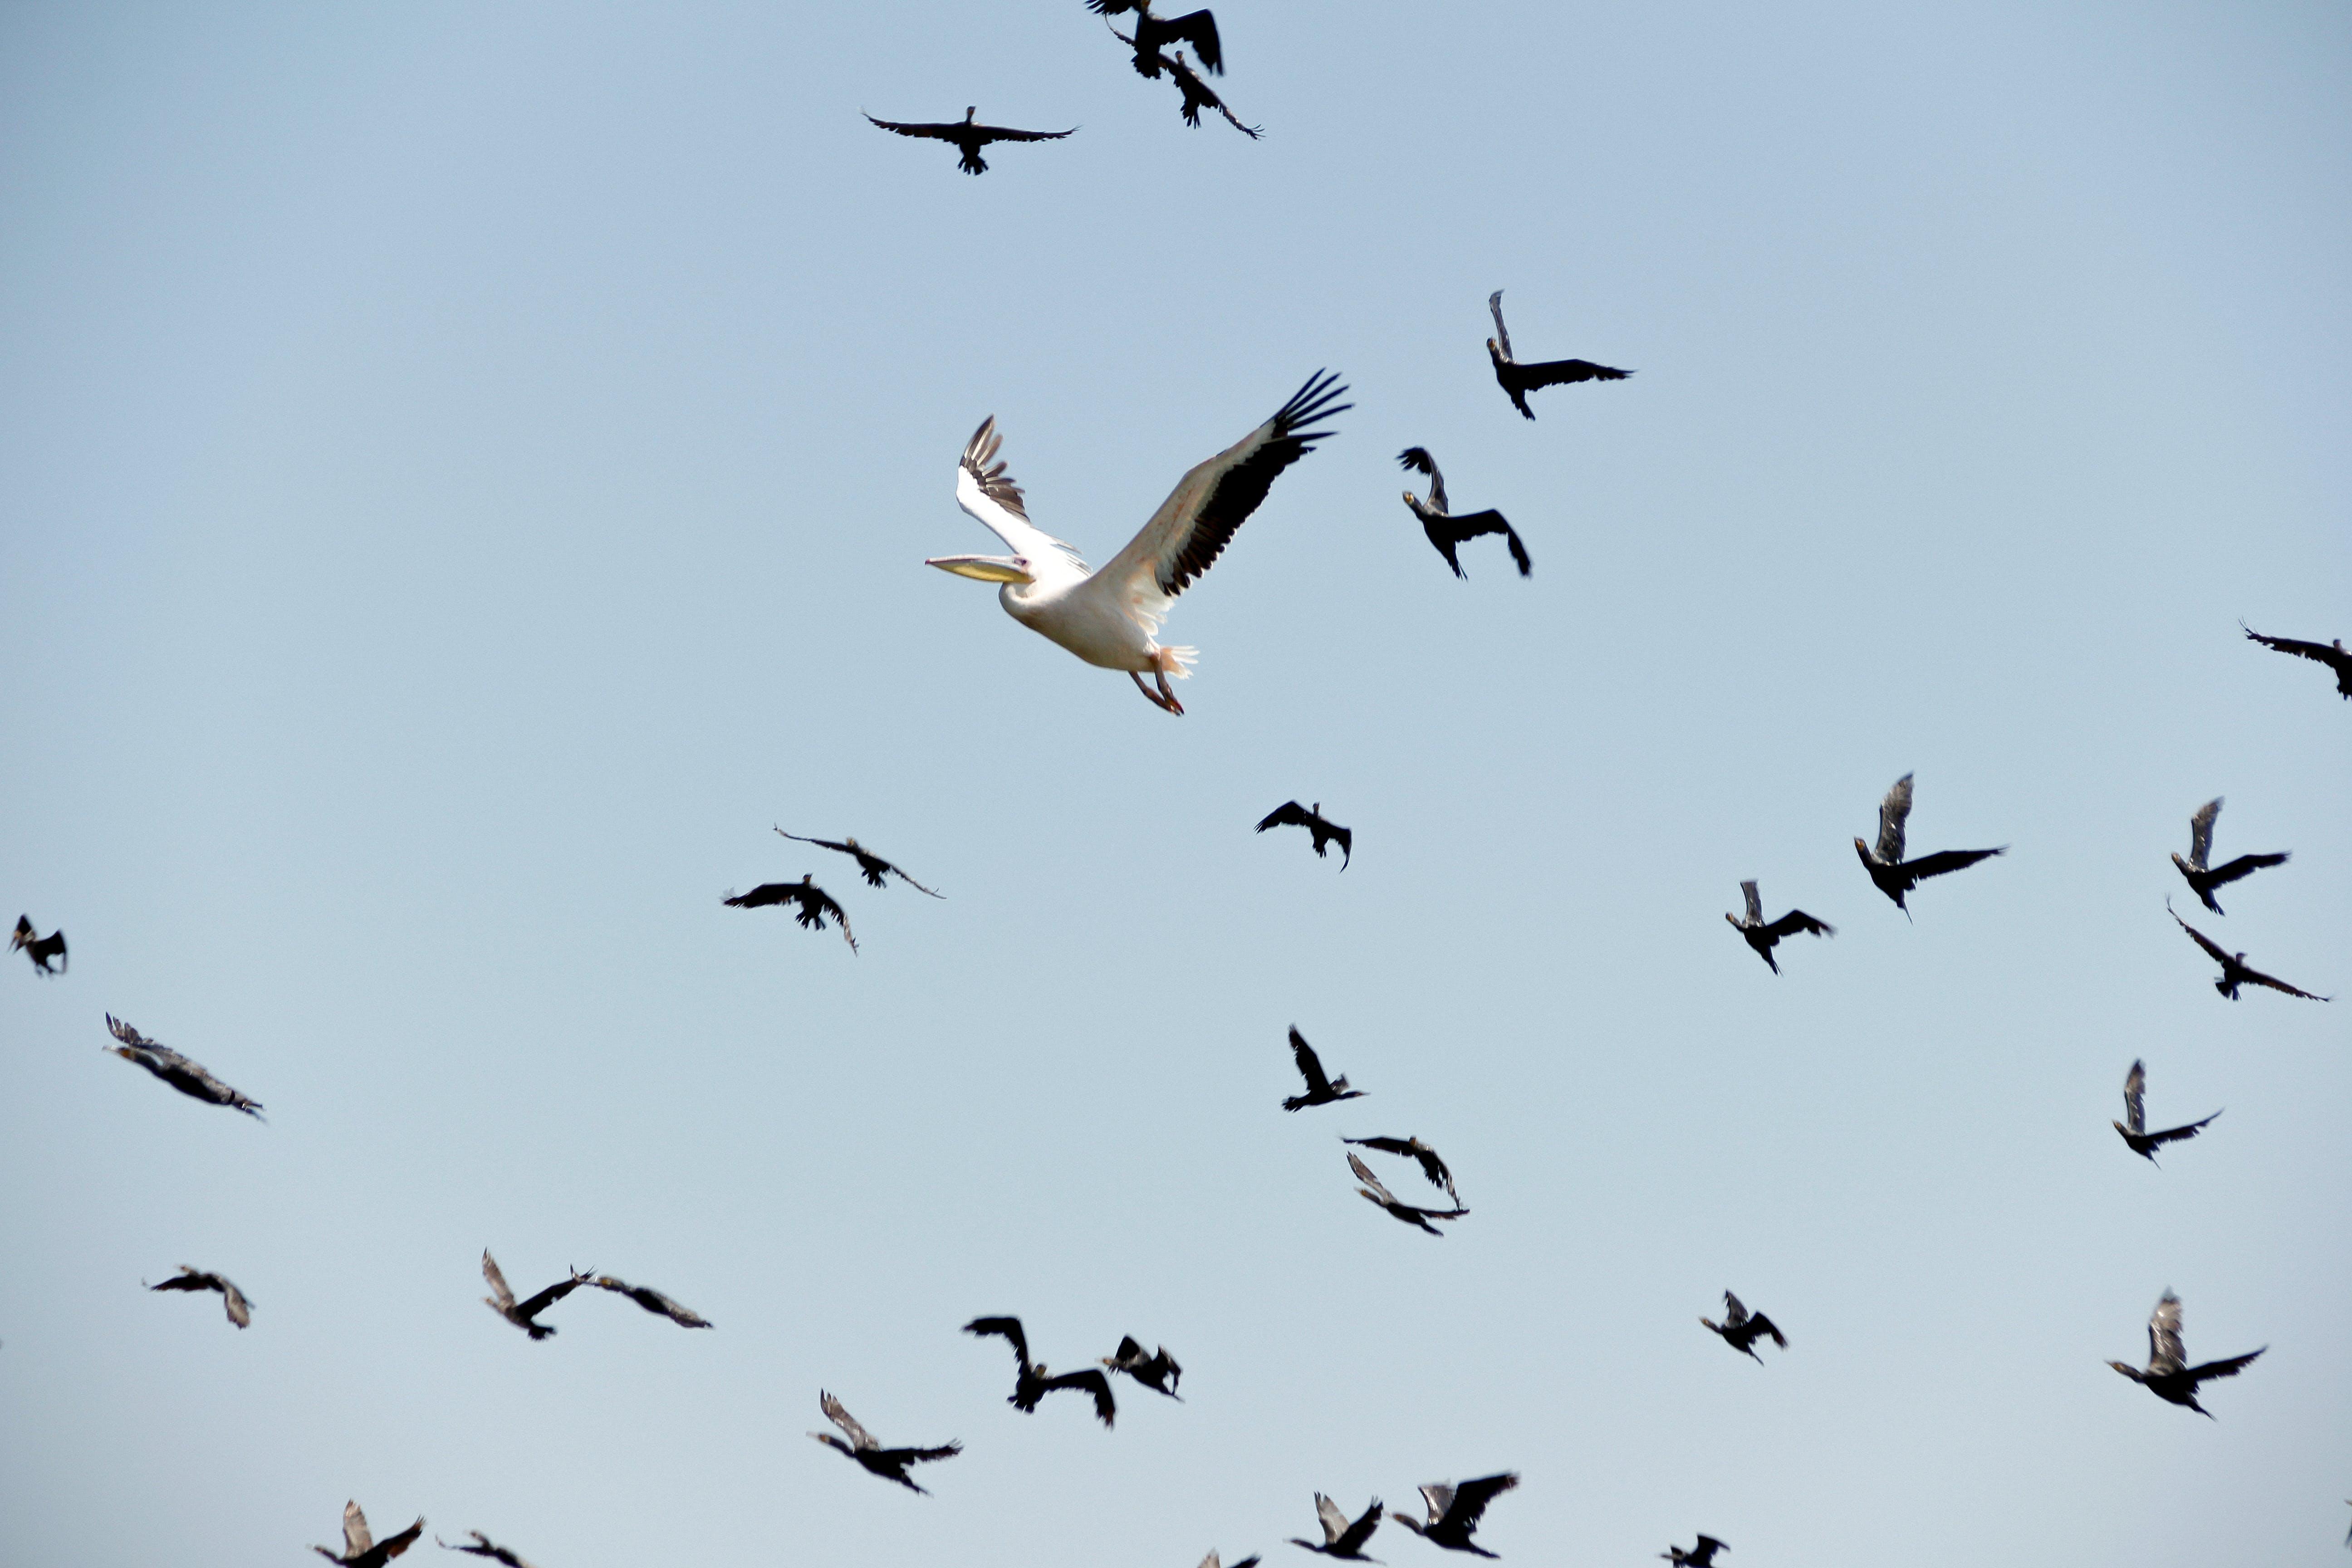 Pelican Snd Seagulls Flying